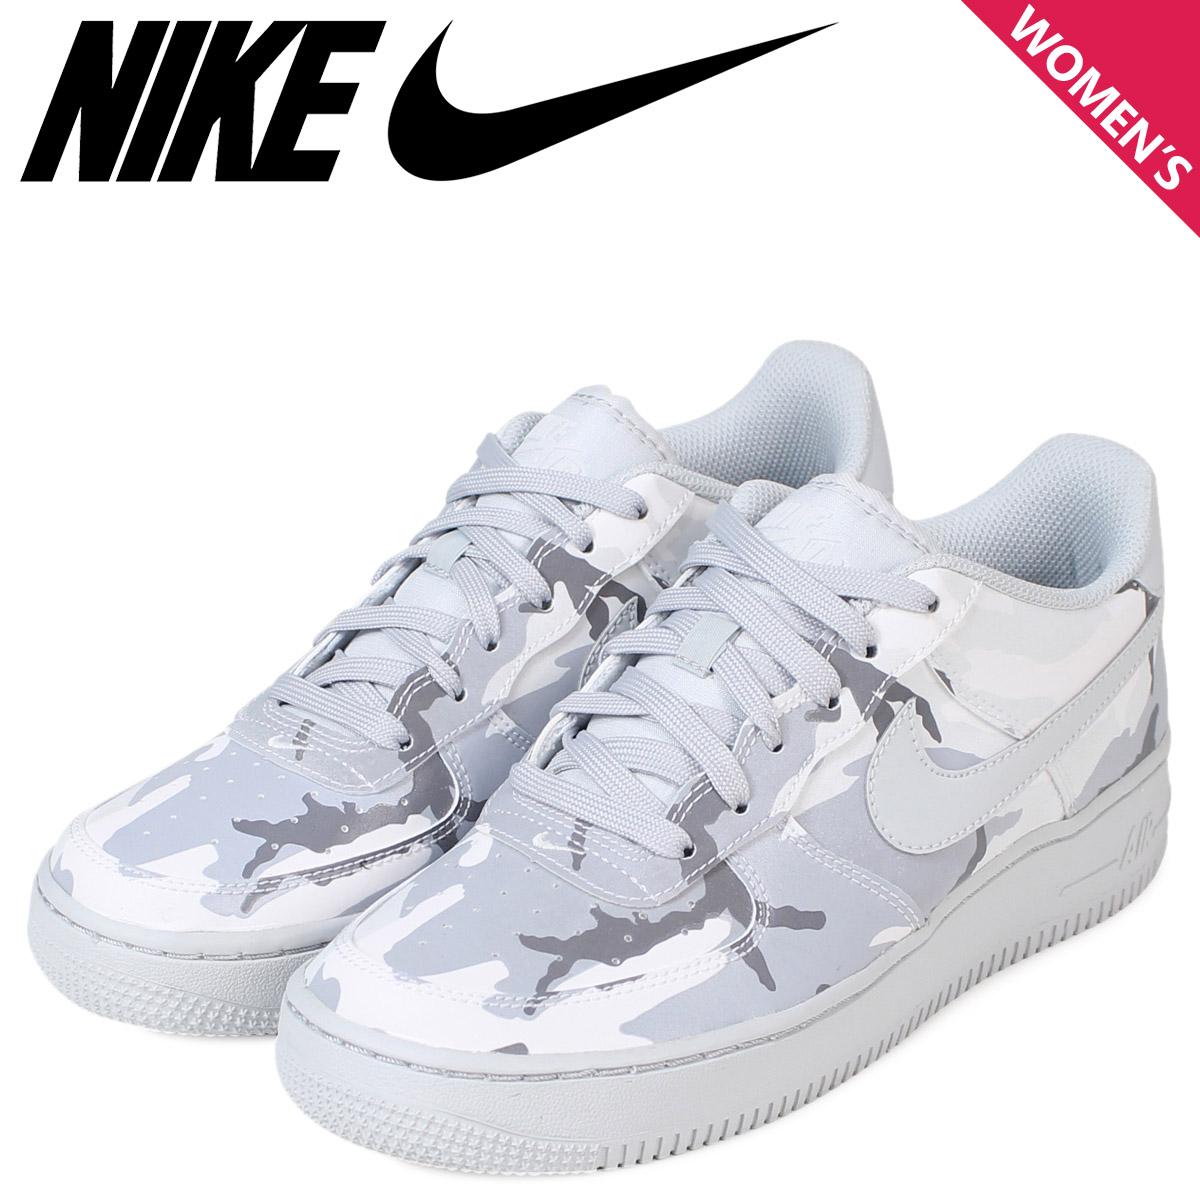 Nike Air Force 1 (GS) White White White | Footshop